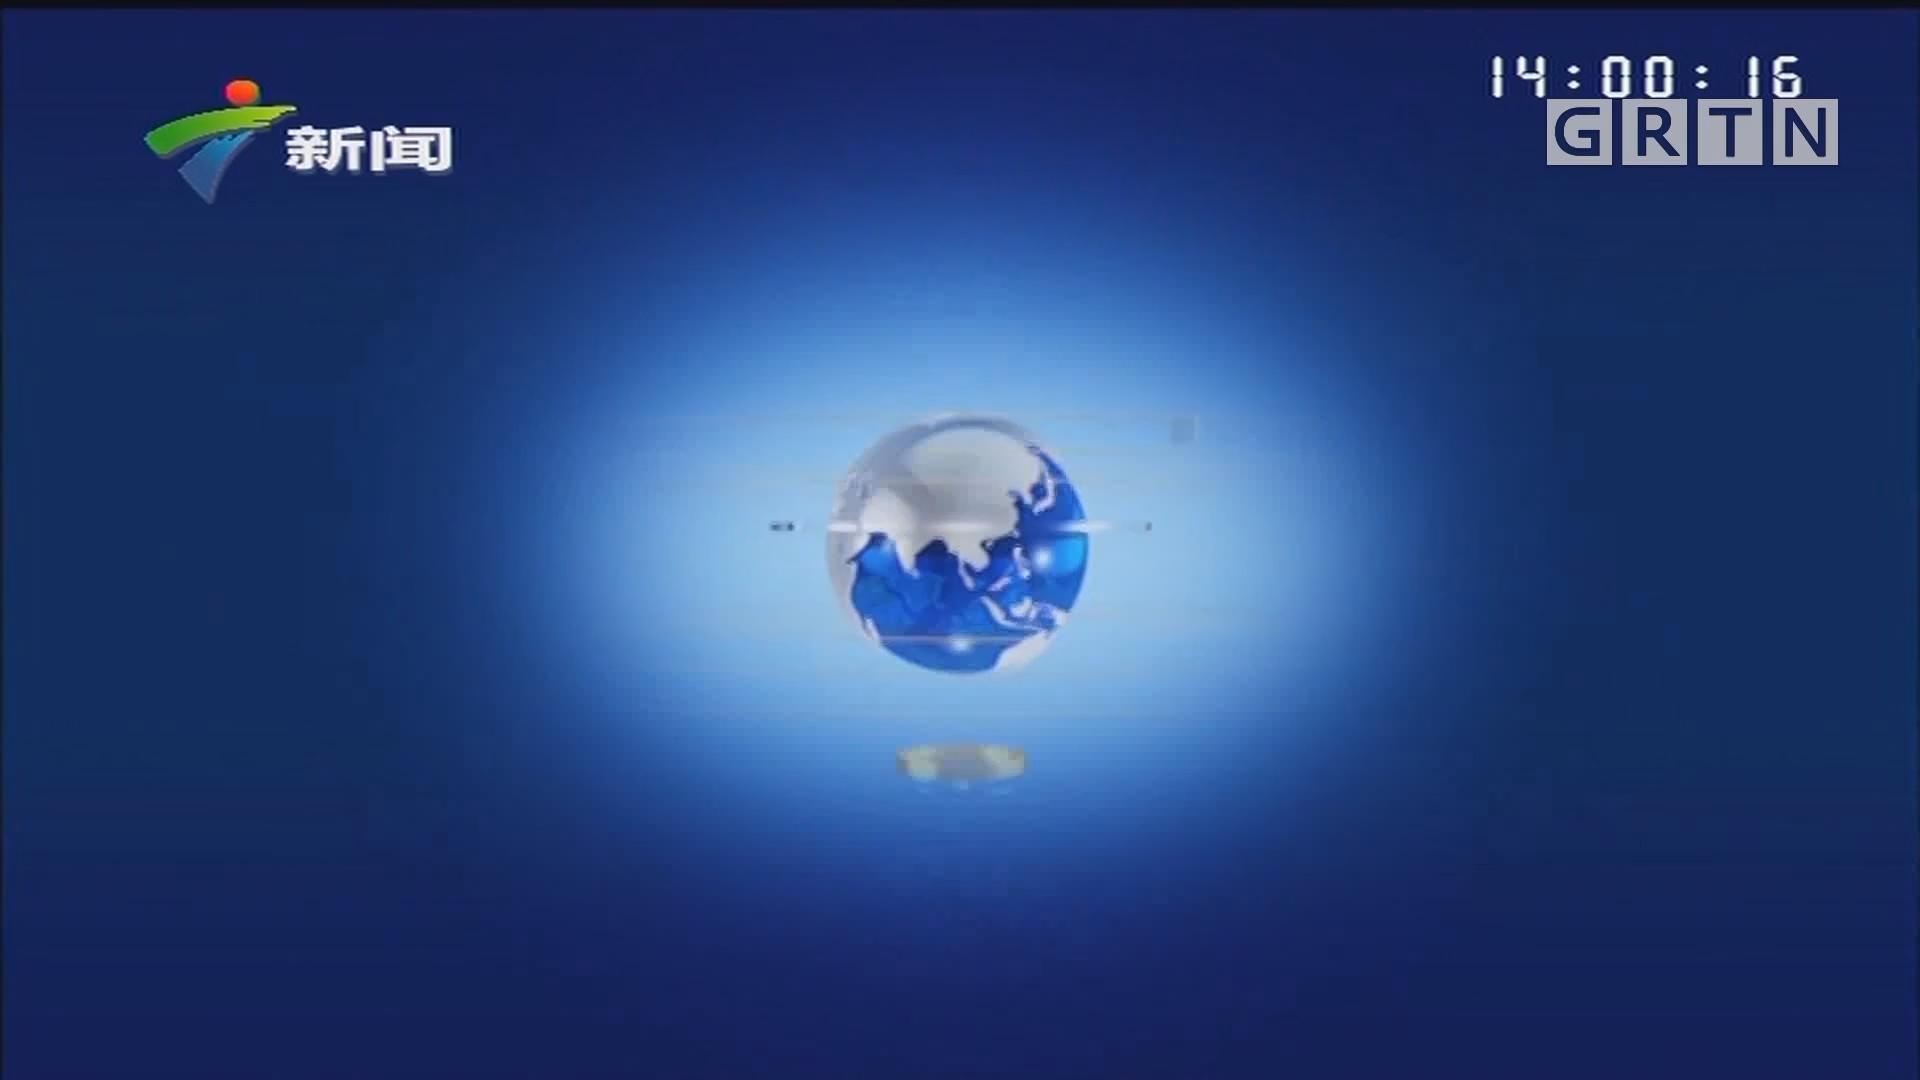 [HD][2019-10-21]正點播報:上海 雙十一臨近 部分快遞公司發出漲價通知